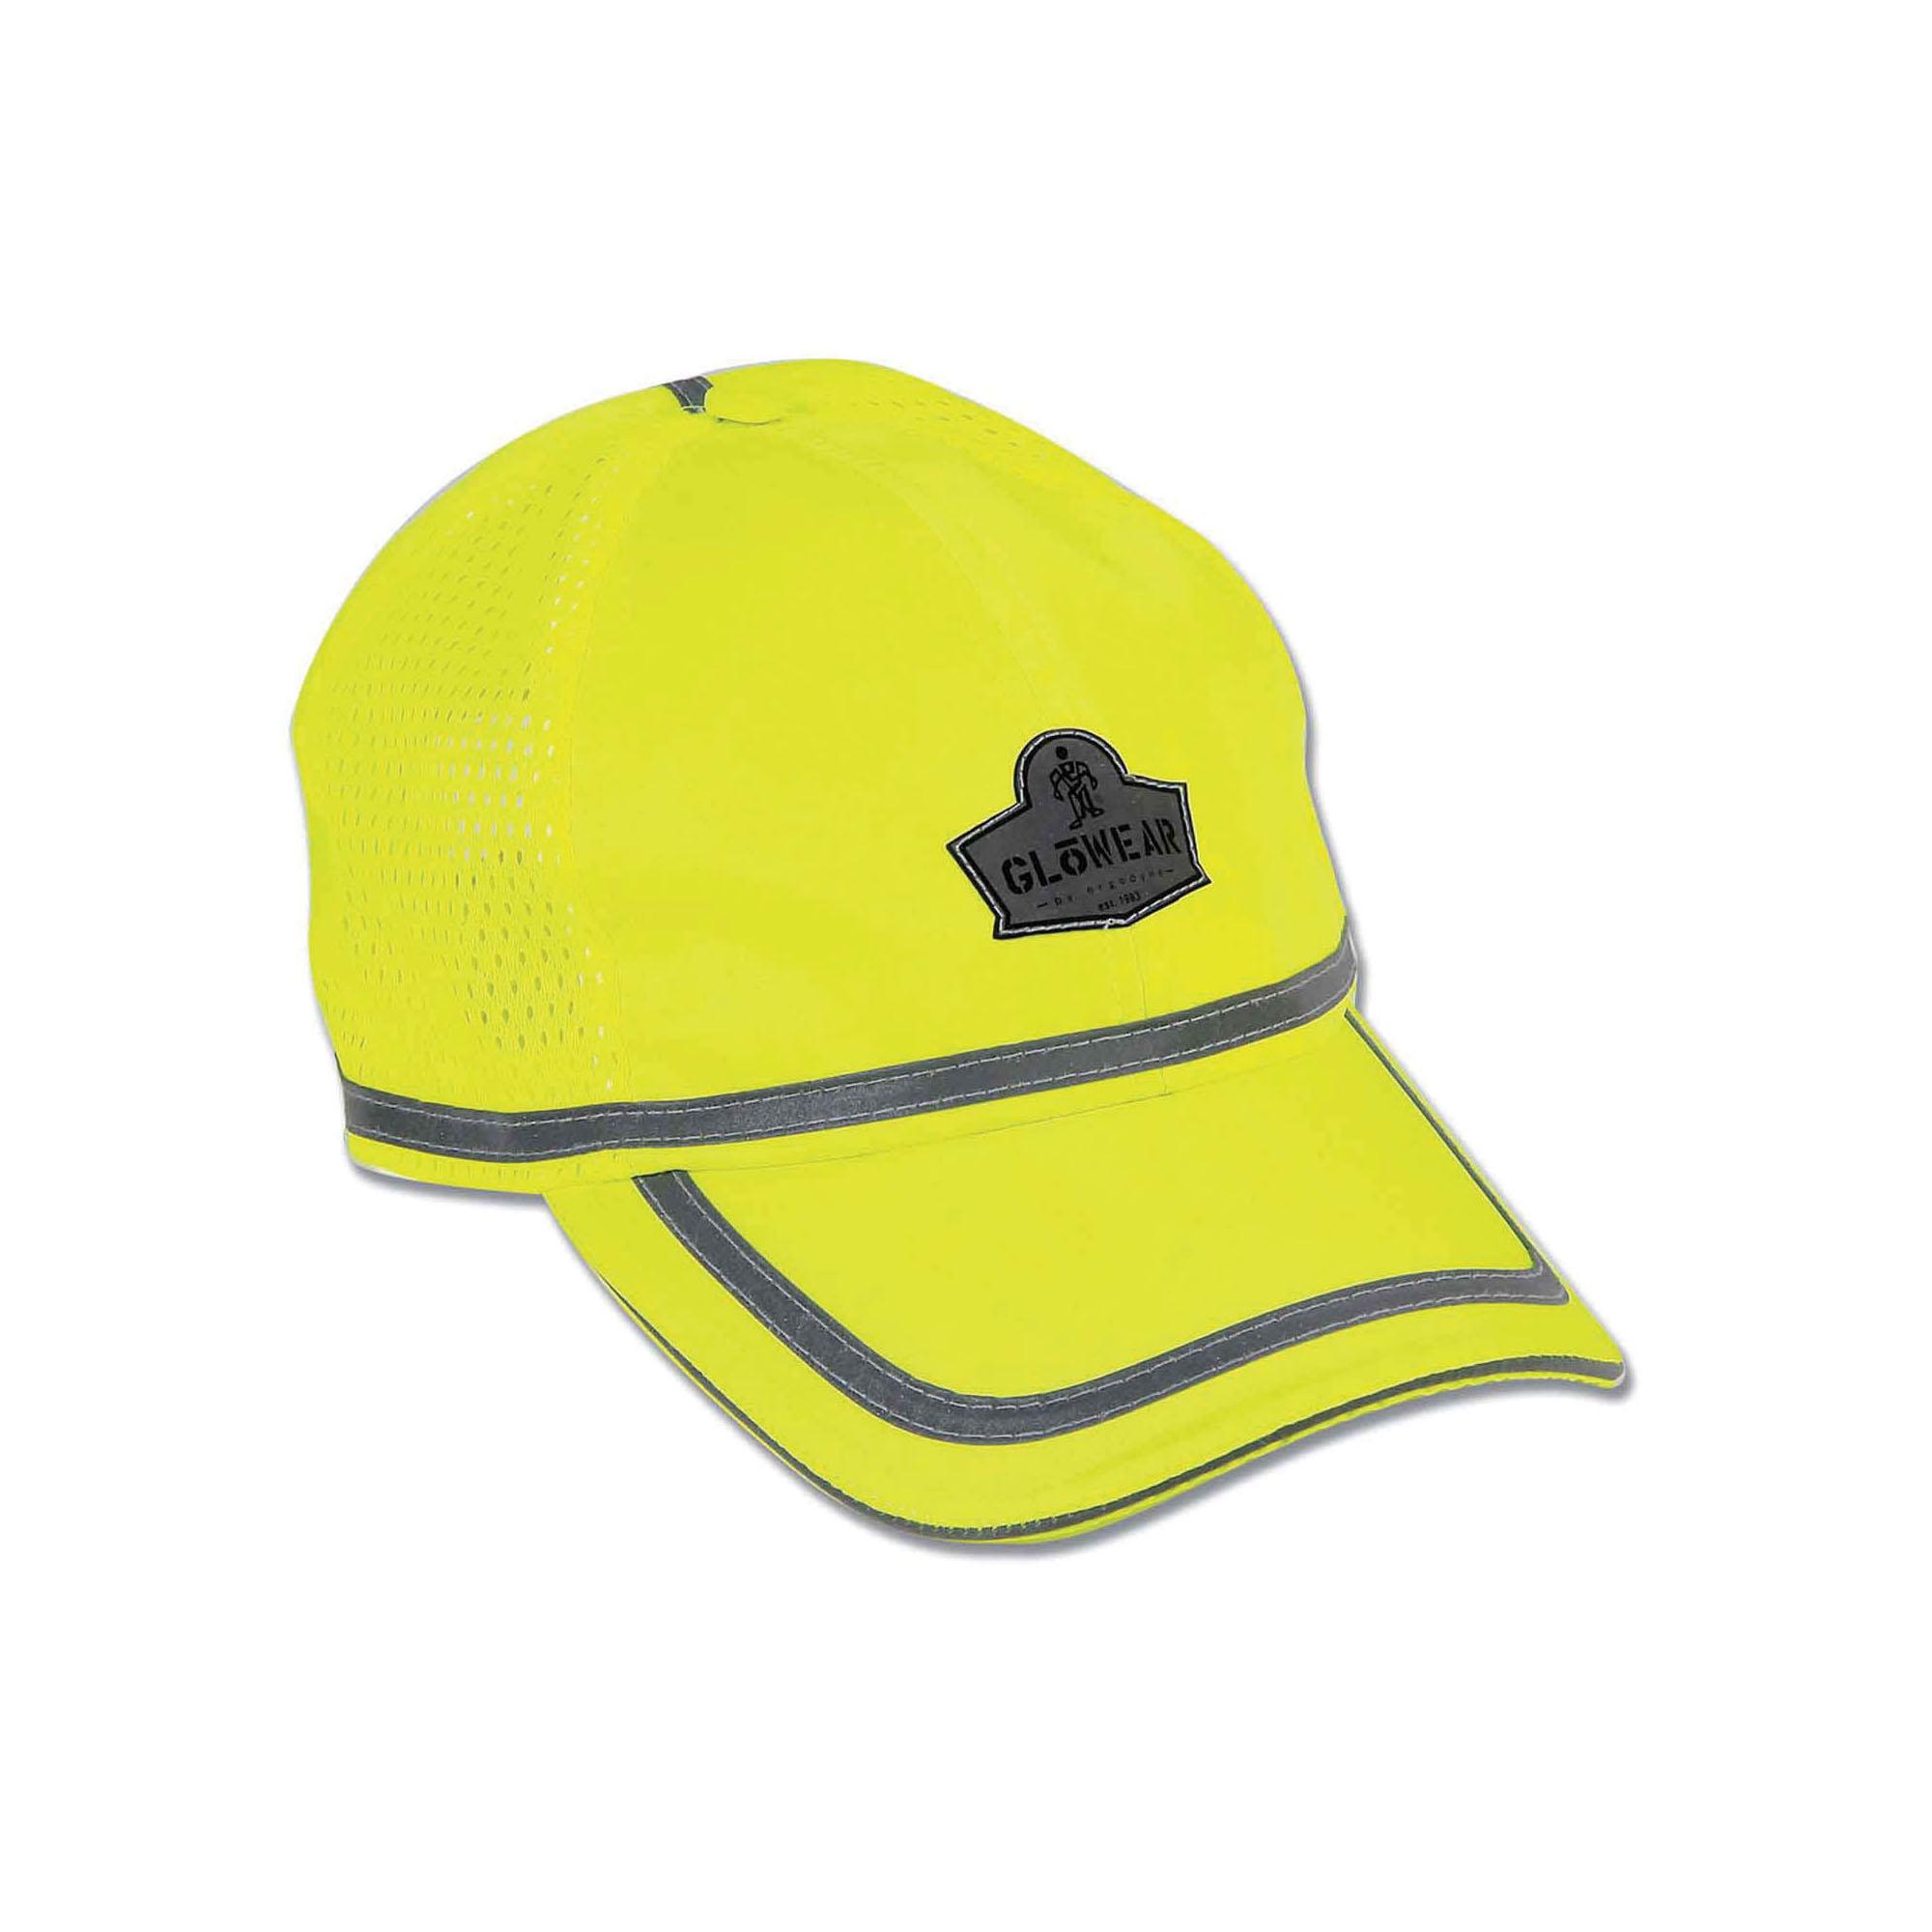 GloWear® 23239 8930 Baseball Cap, Universal, Hi-Viz Lime, 150D Oxford Polyester